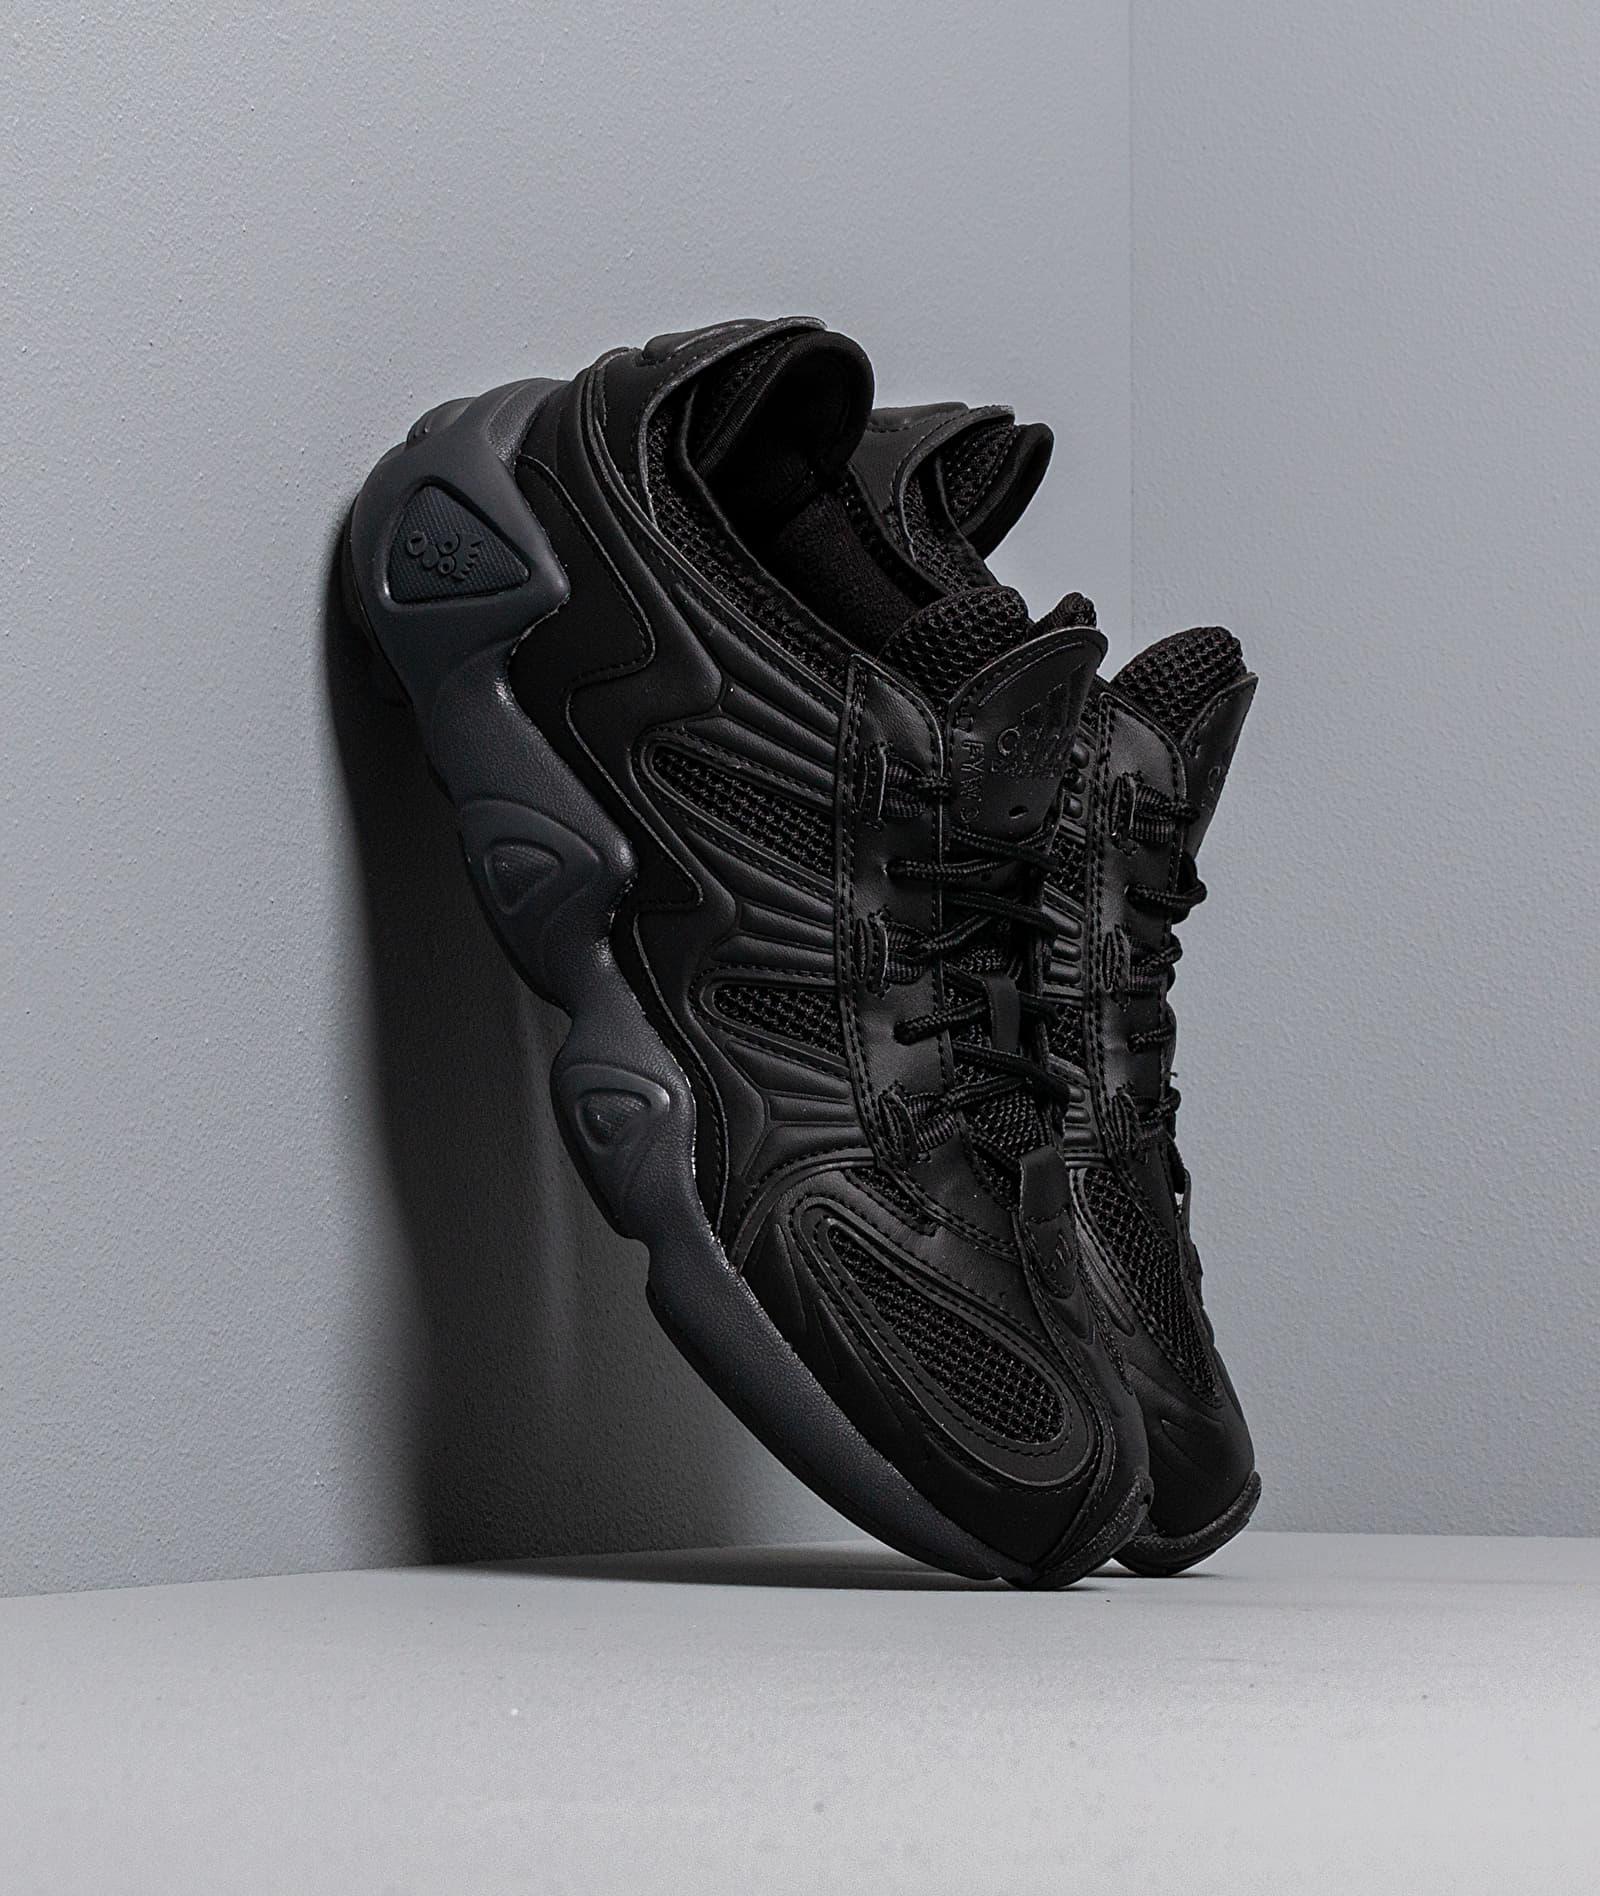 adidas FYW S-97 Core Black/ Core Black/ Carbon EE5309